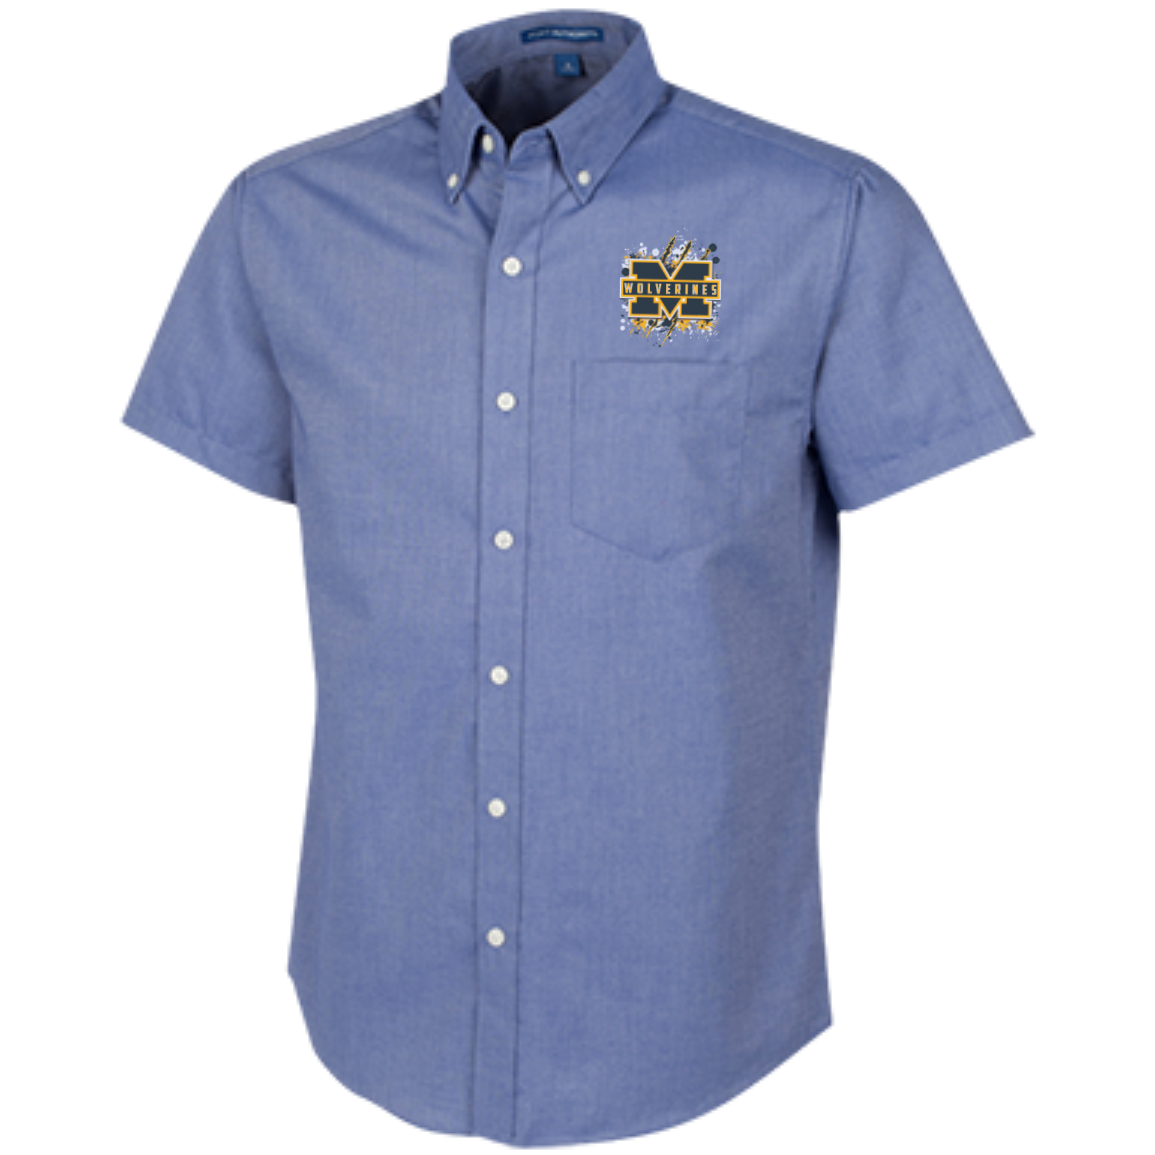 Michigan Wolverines Splatter Logo Men's Short Sleeve Oxford Shirt